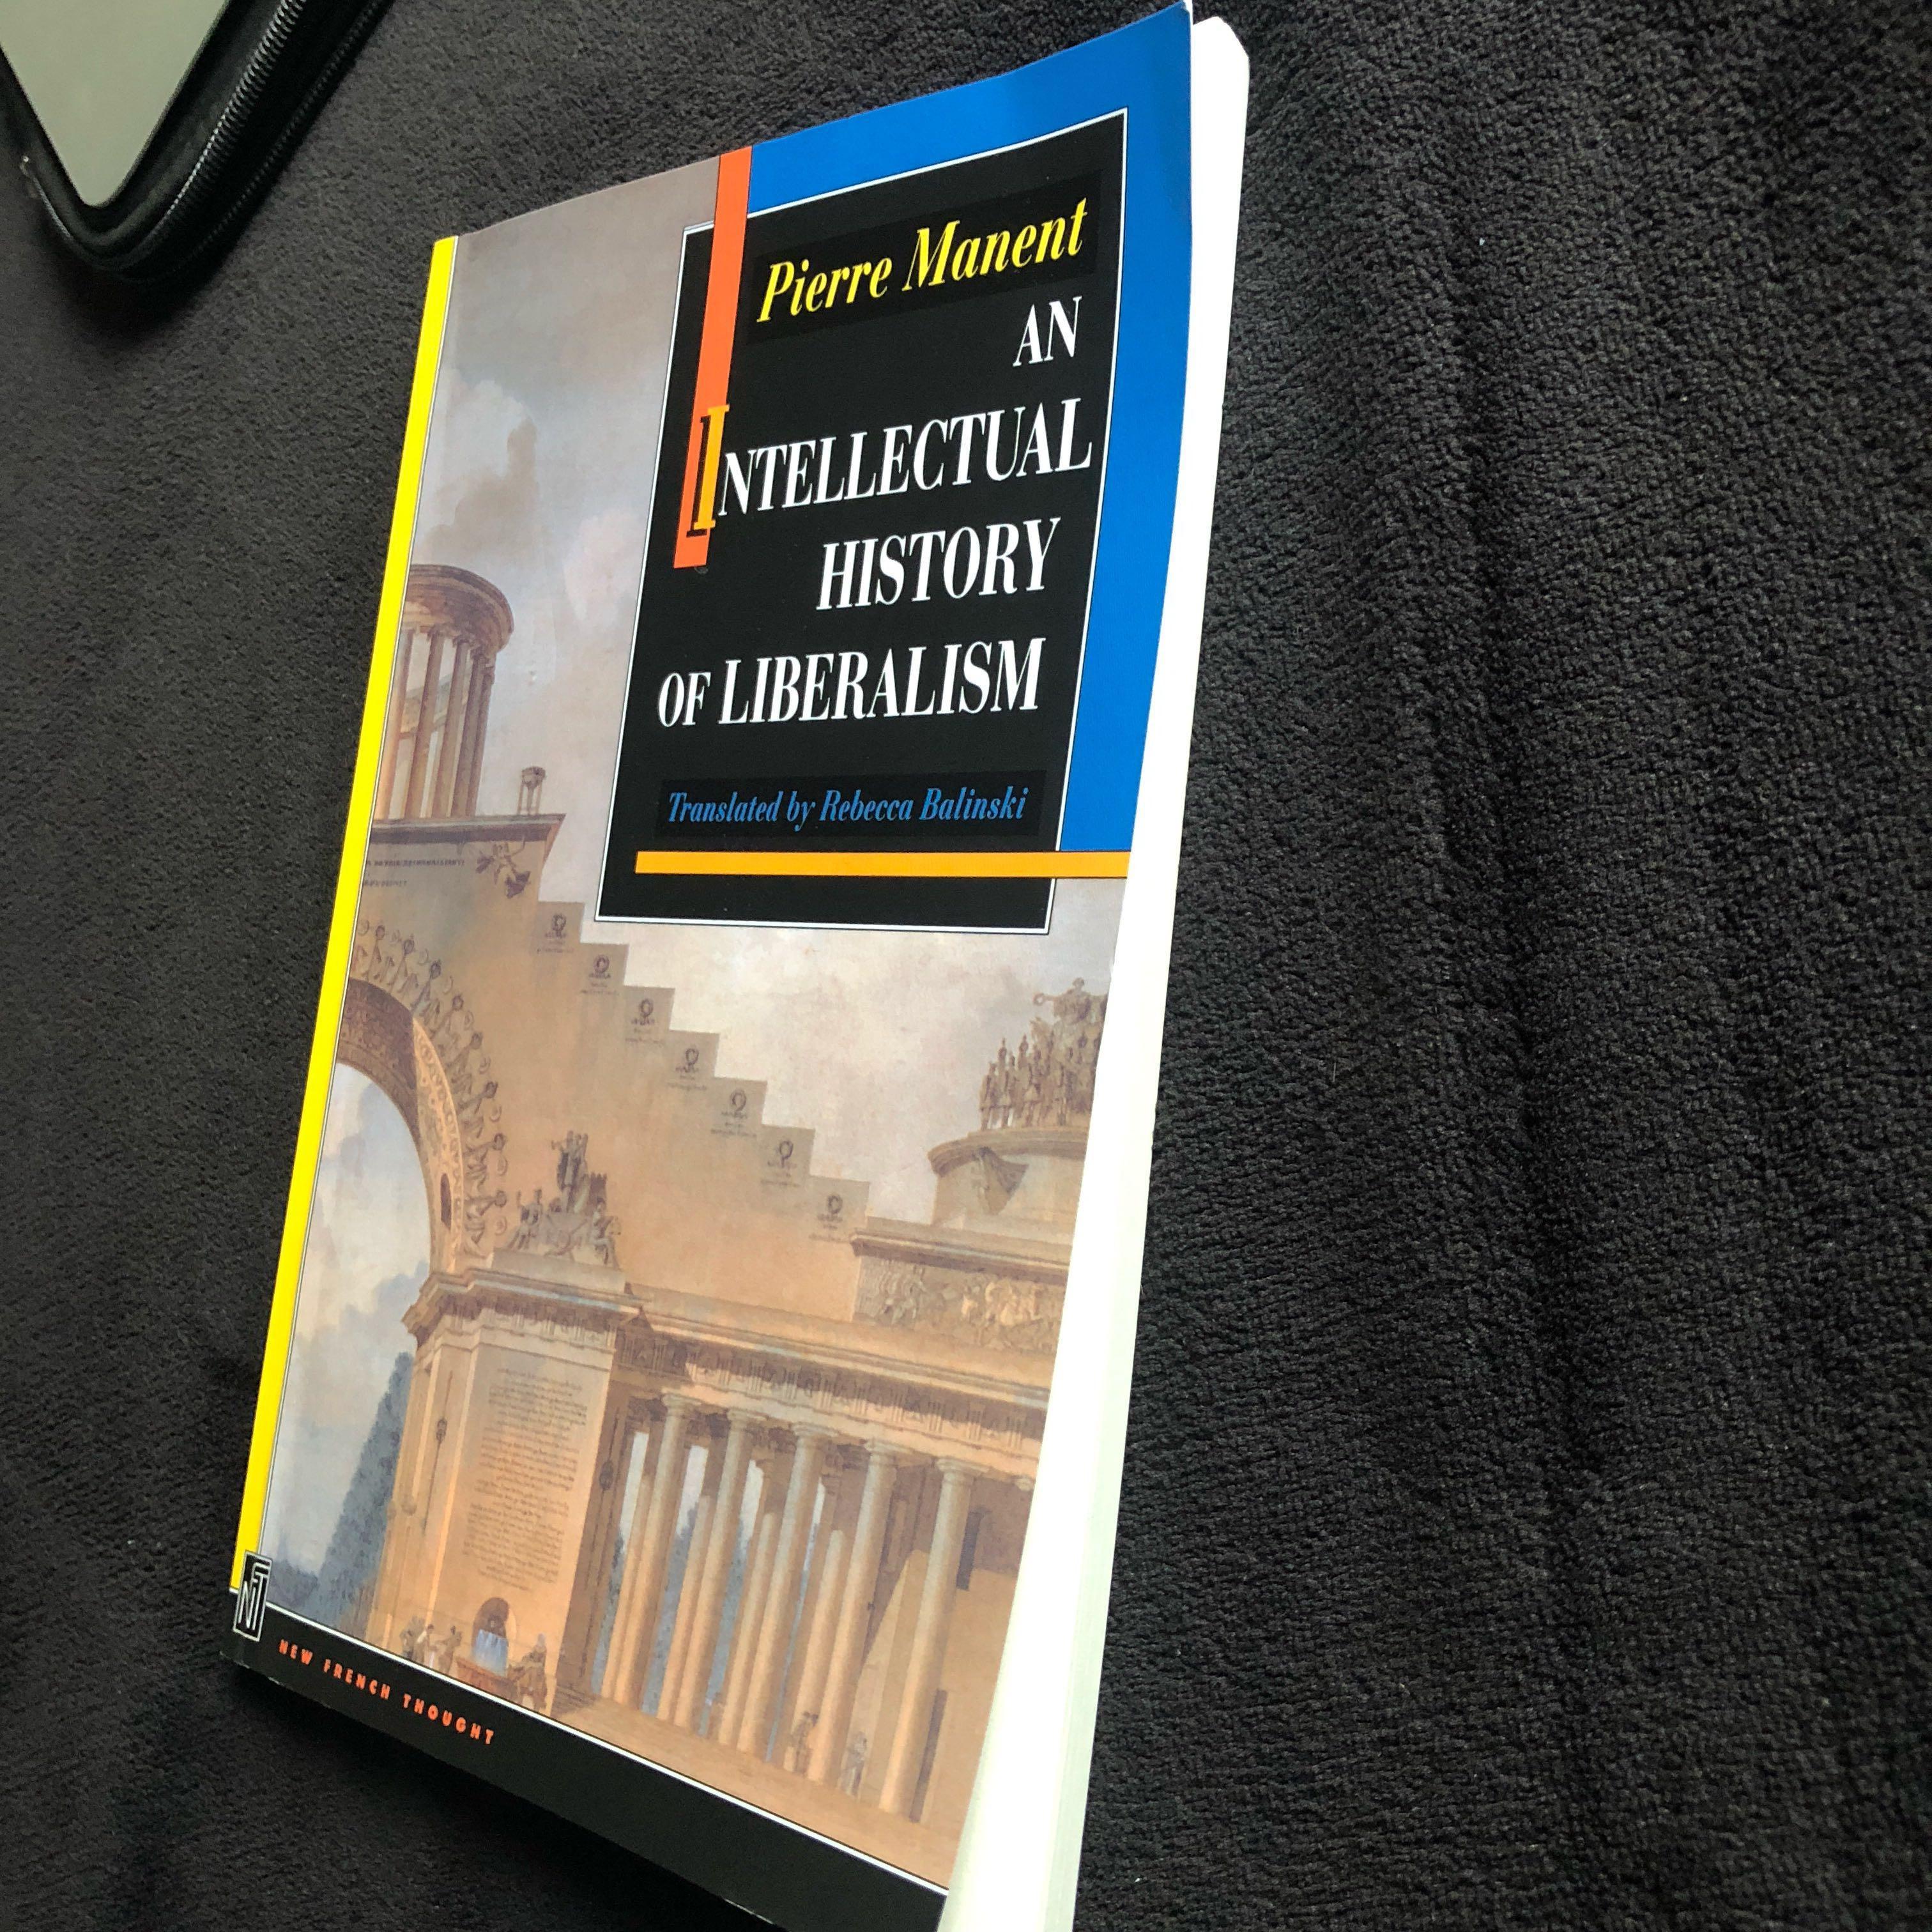 Manent: An Intellectual History of Liberalism AP/ HREQ2010